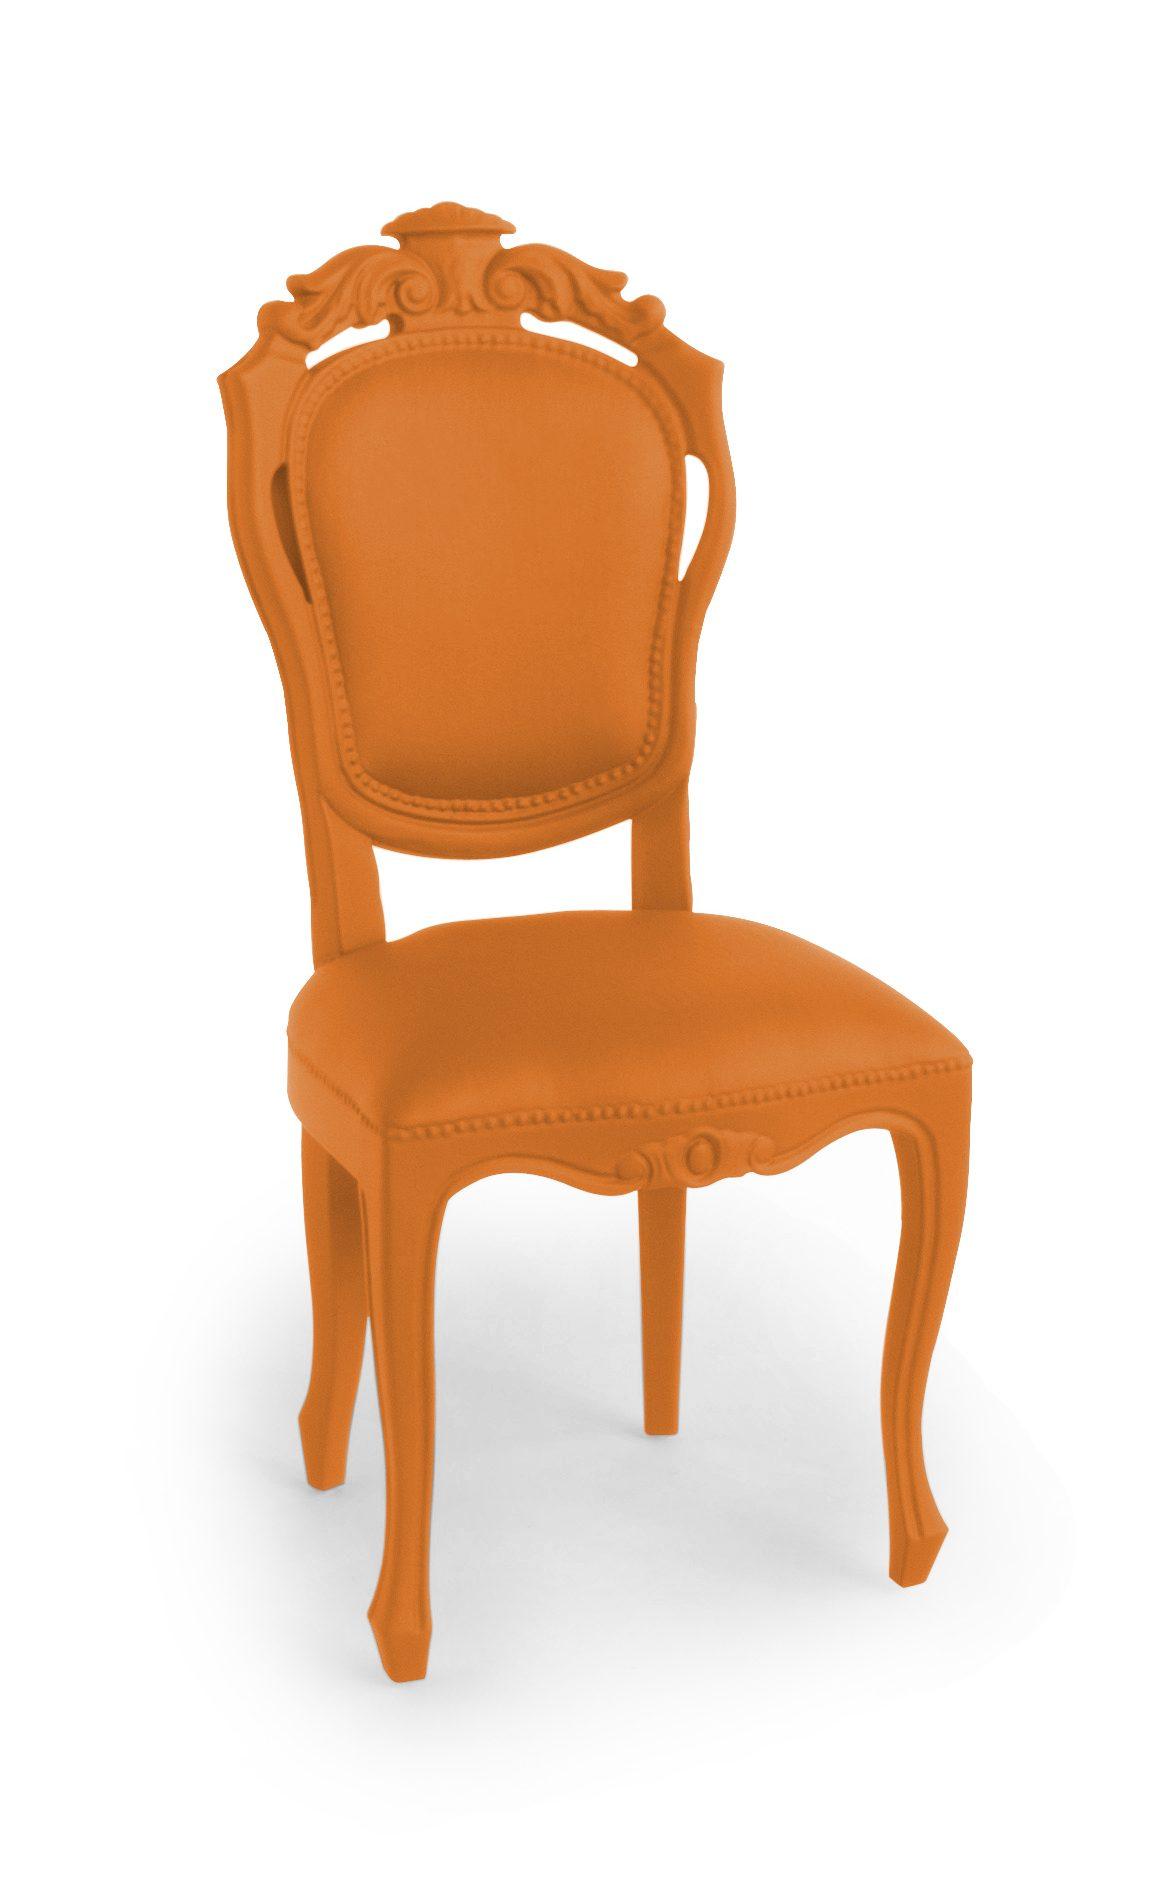 Jspr Plastic Fantastic Dining Chair Orange Exclusieve Stoel Oranje Webshop